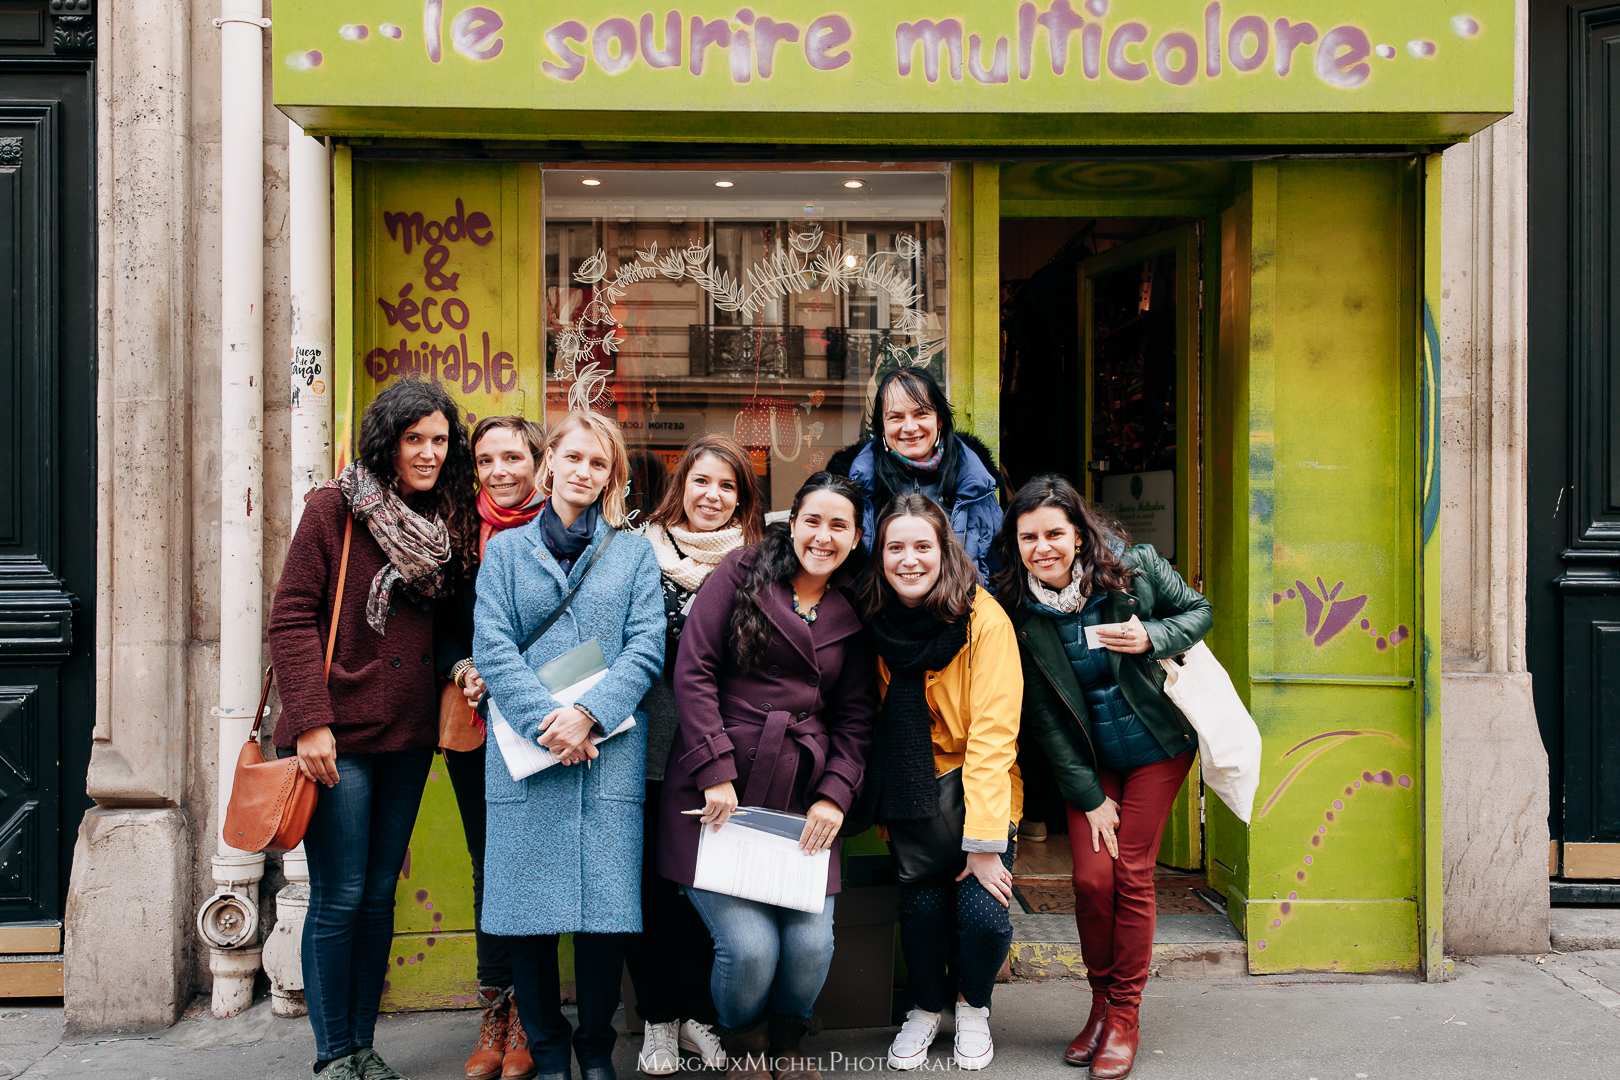 Le sourire multicolore, une boutique super originale !